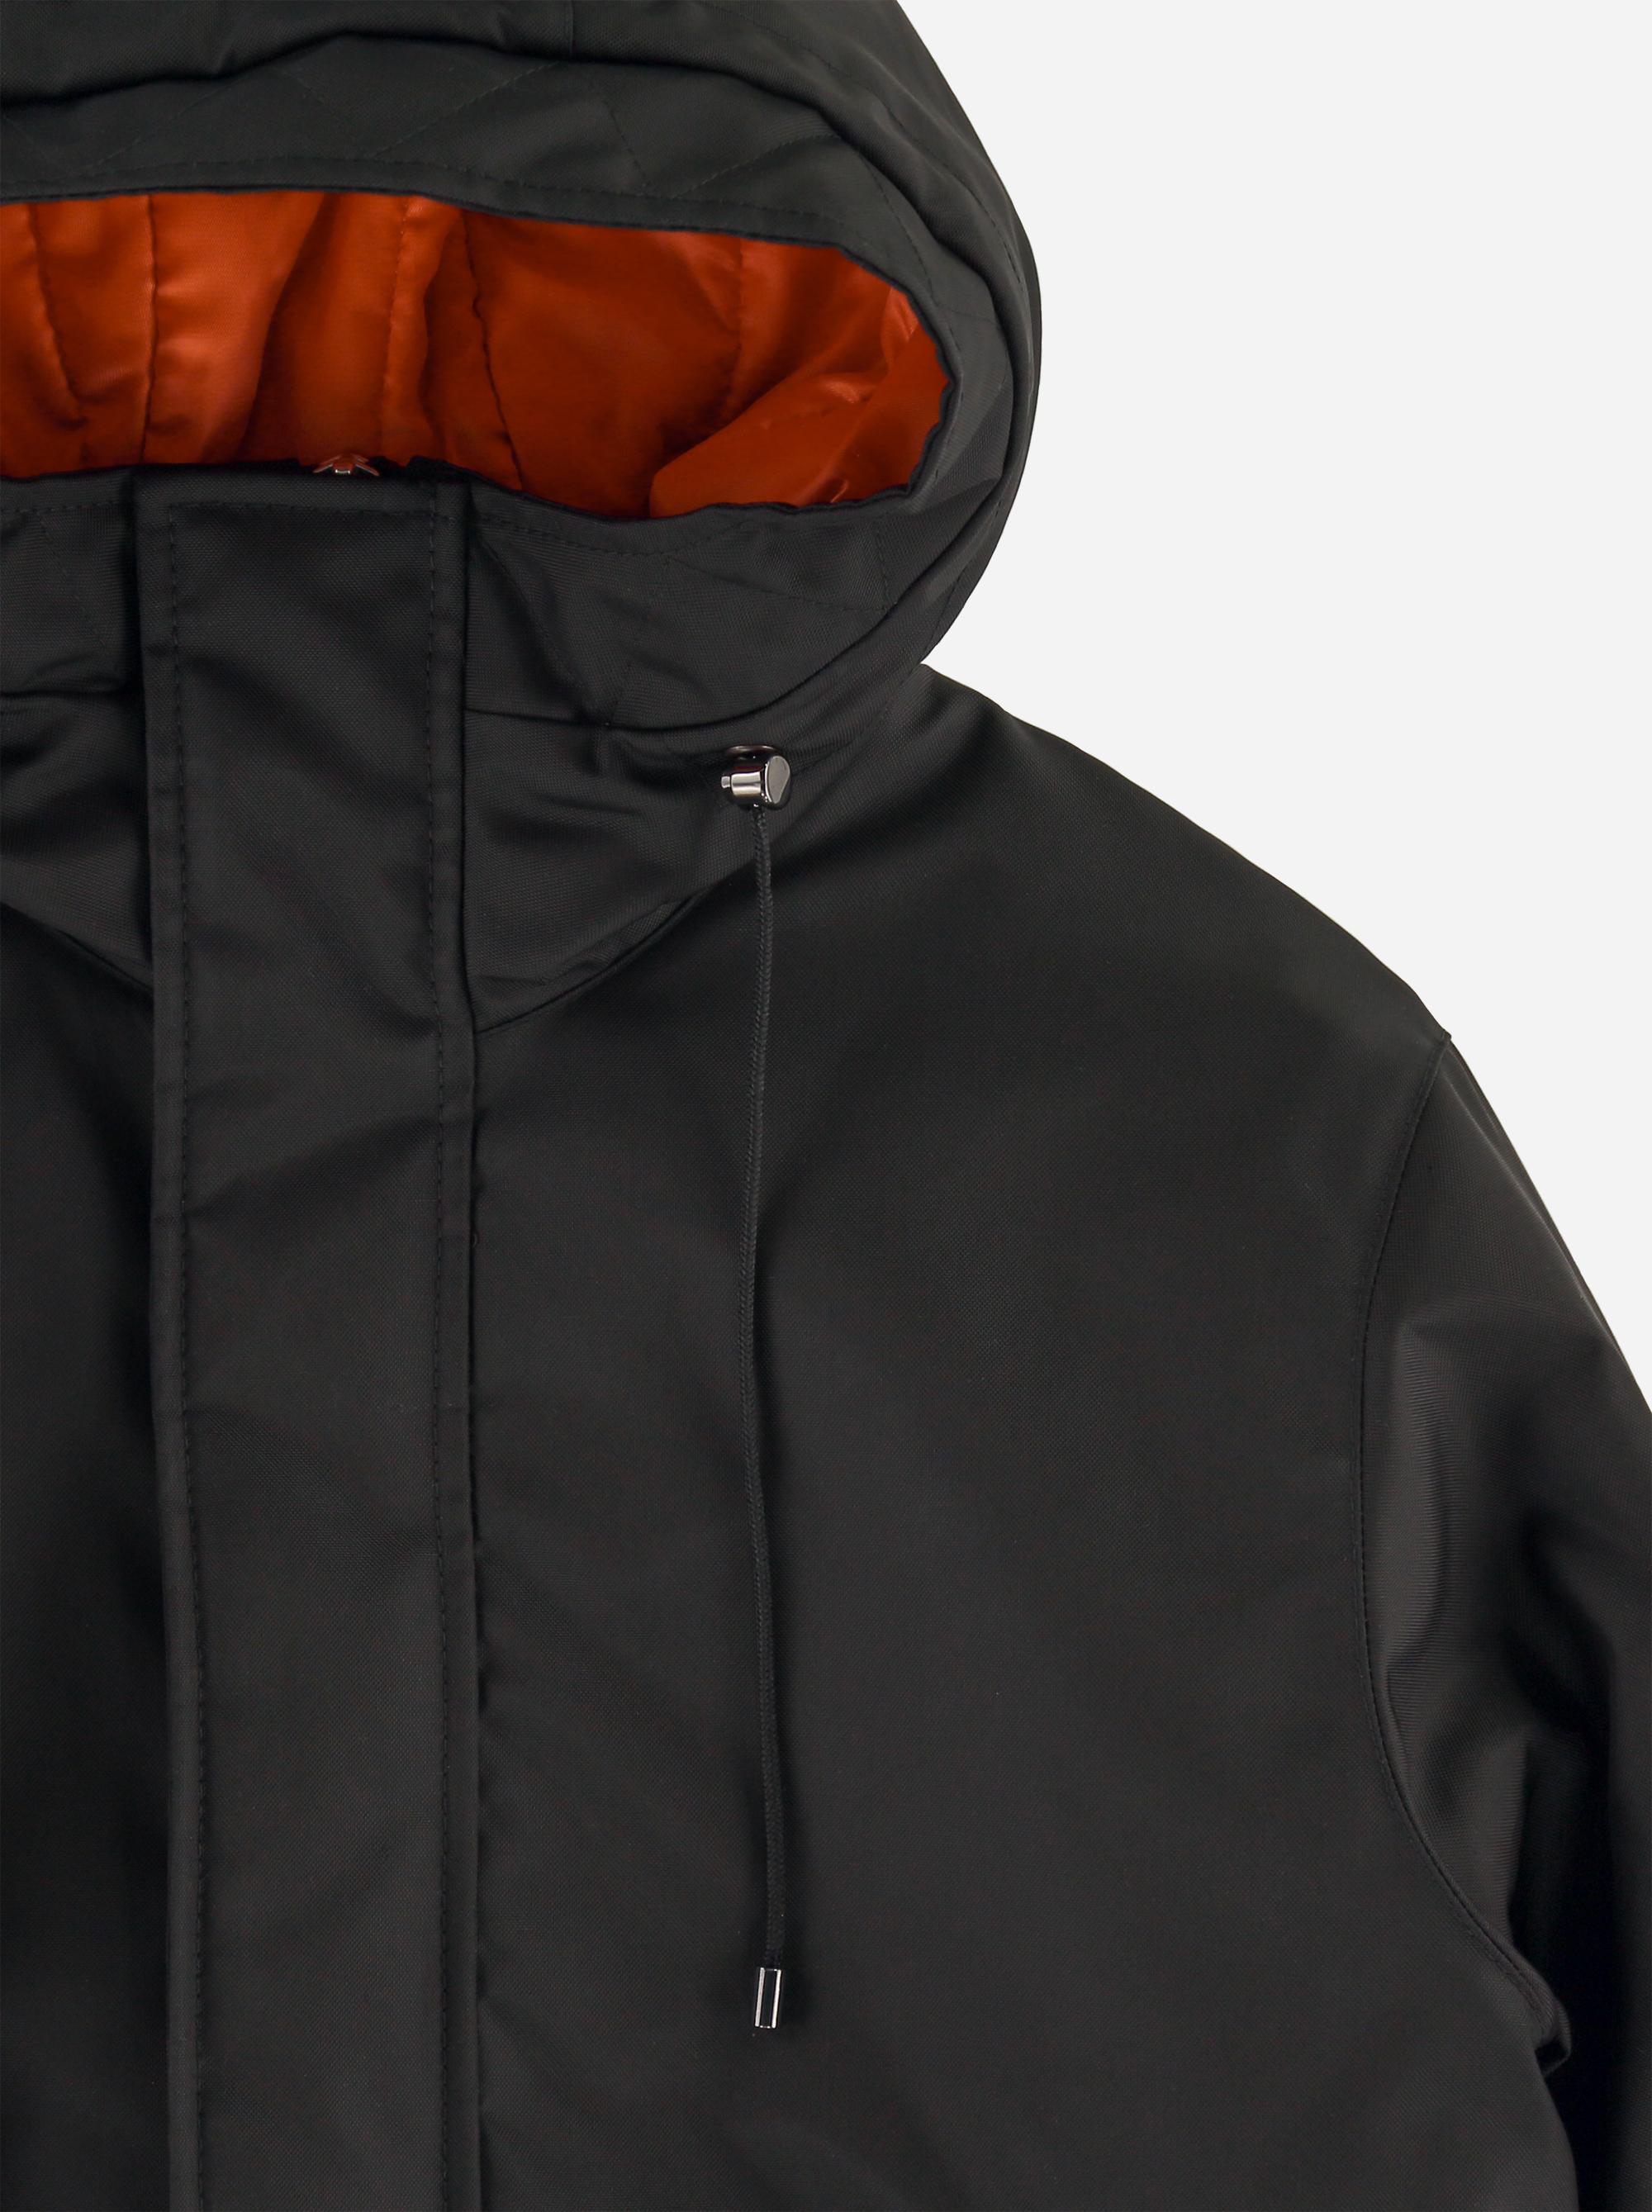 Teym_ParkaMatte_Black Orange_Men_detail1